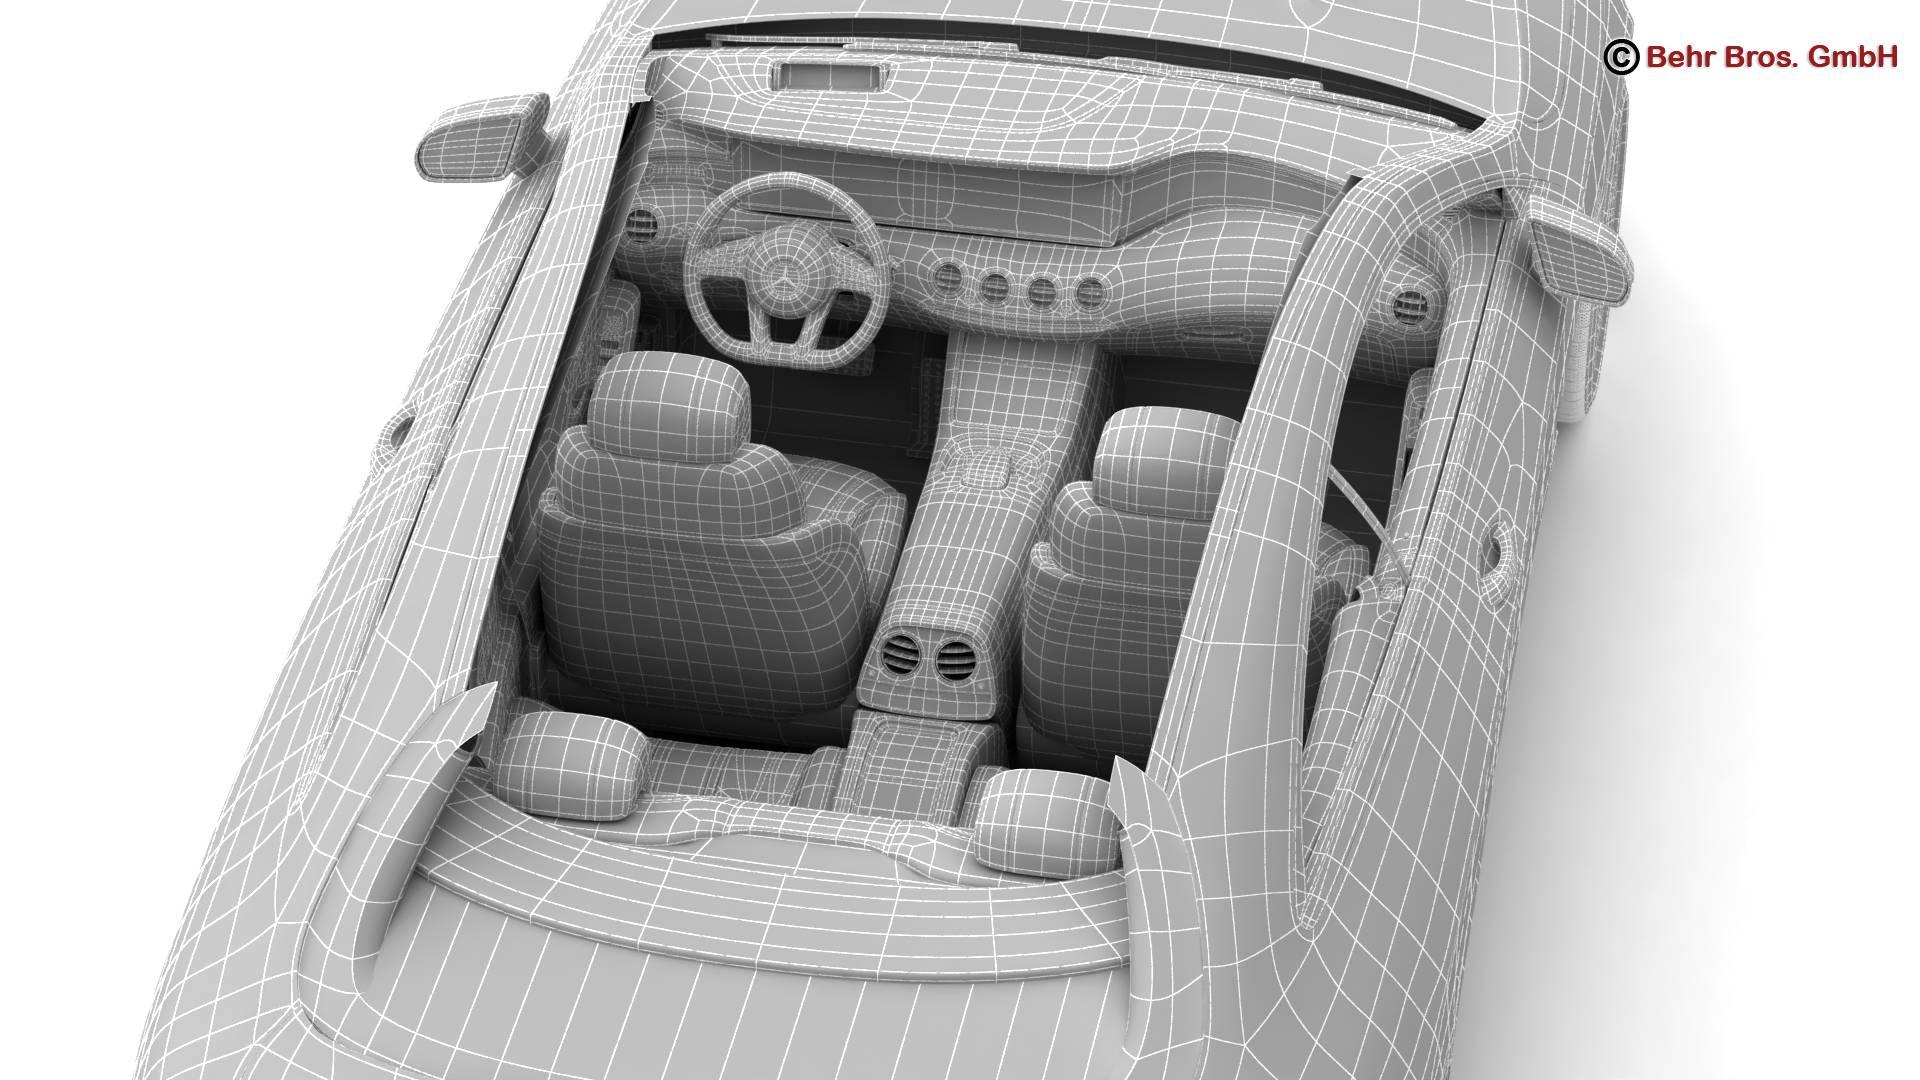 mercedes s class coupe amg s63 2018 3d model 3ds max fbx c4d lwo ma mb obj 274115